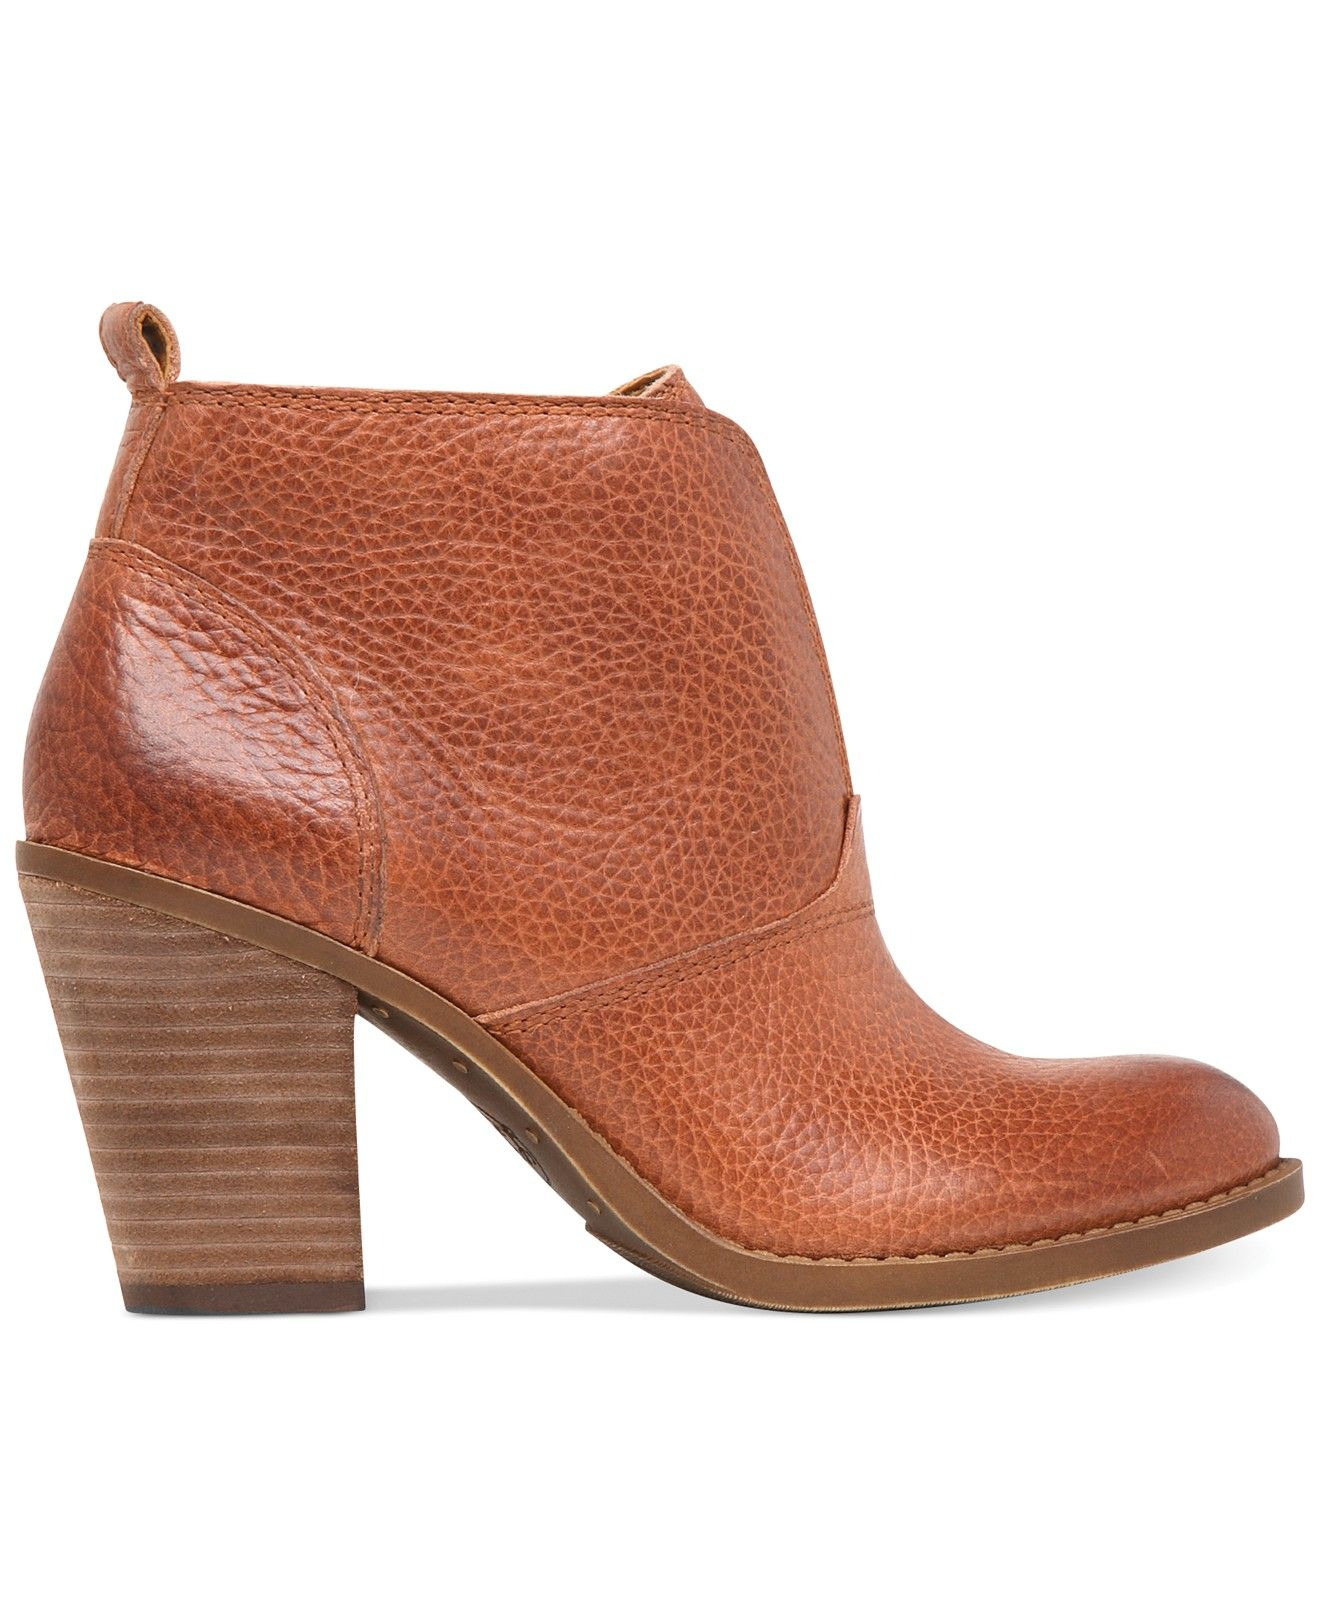 17d2dc725fb Lucky Brand Women's Ehllen Booties - Boots - Shoes - Macy's   My ...